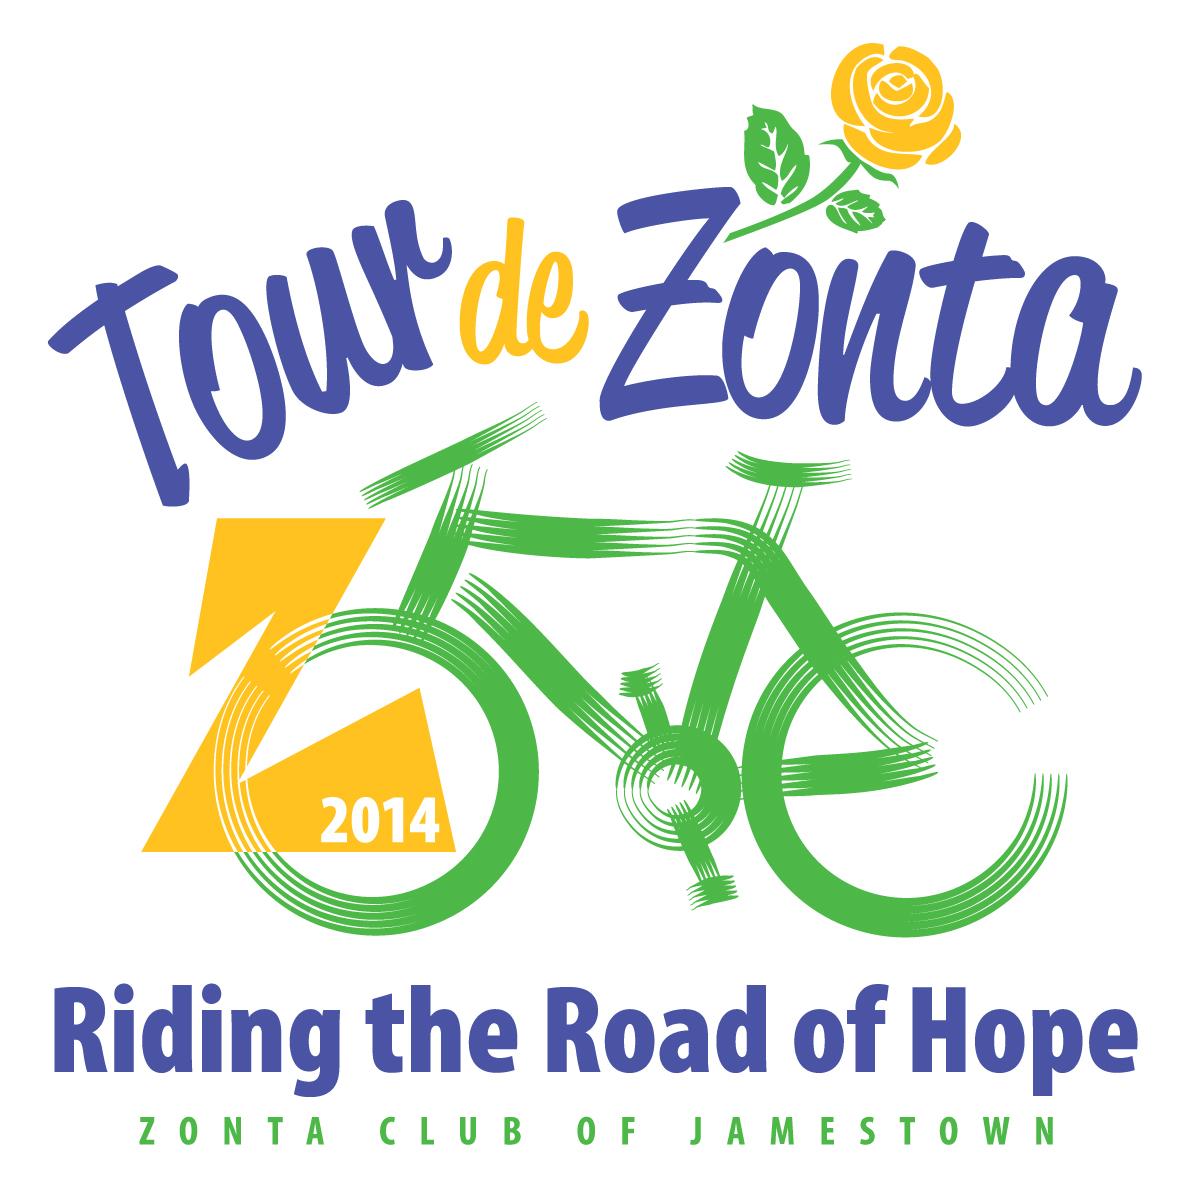 2014 Zonta Bike Rally!